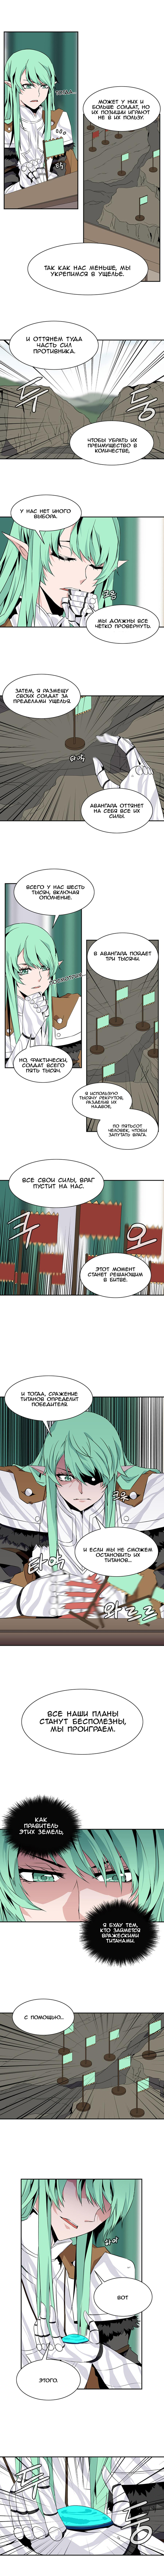 https://r1.ninemanga.com/comics/pic2/48/28784/322636/1491955673397.jpg Page 4